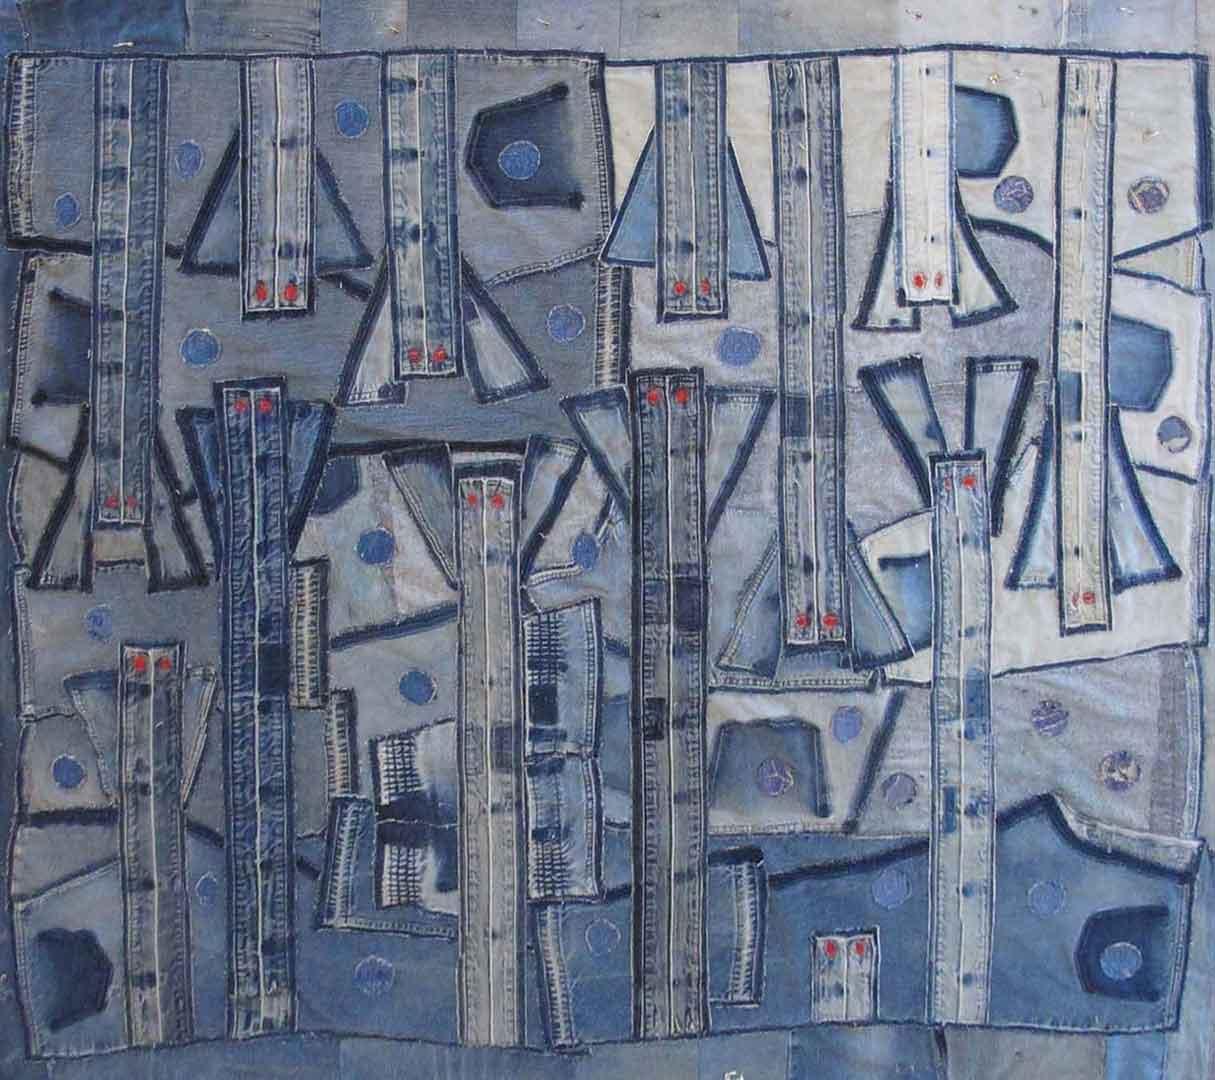 Denim artwork by Judith Tinkl